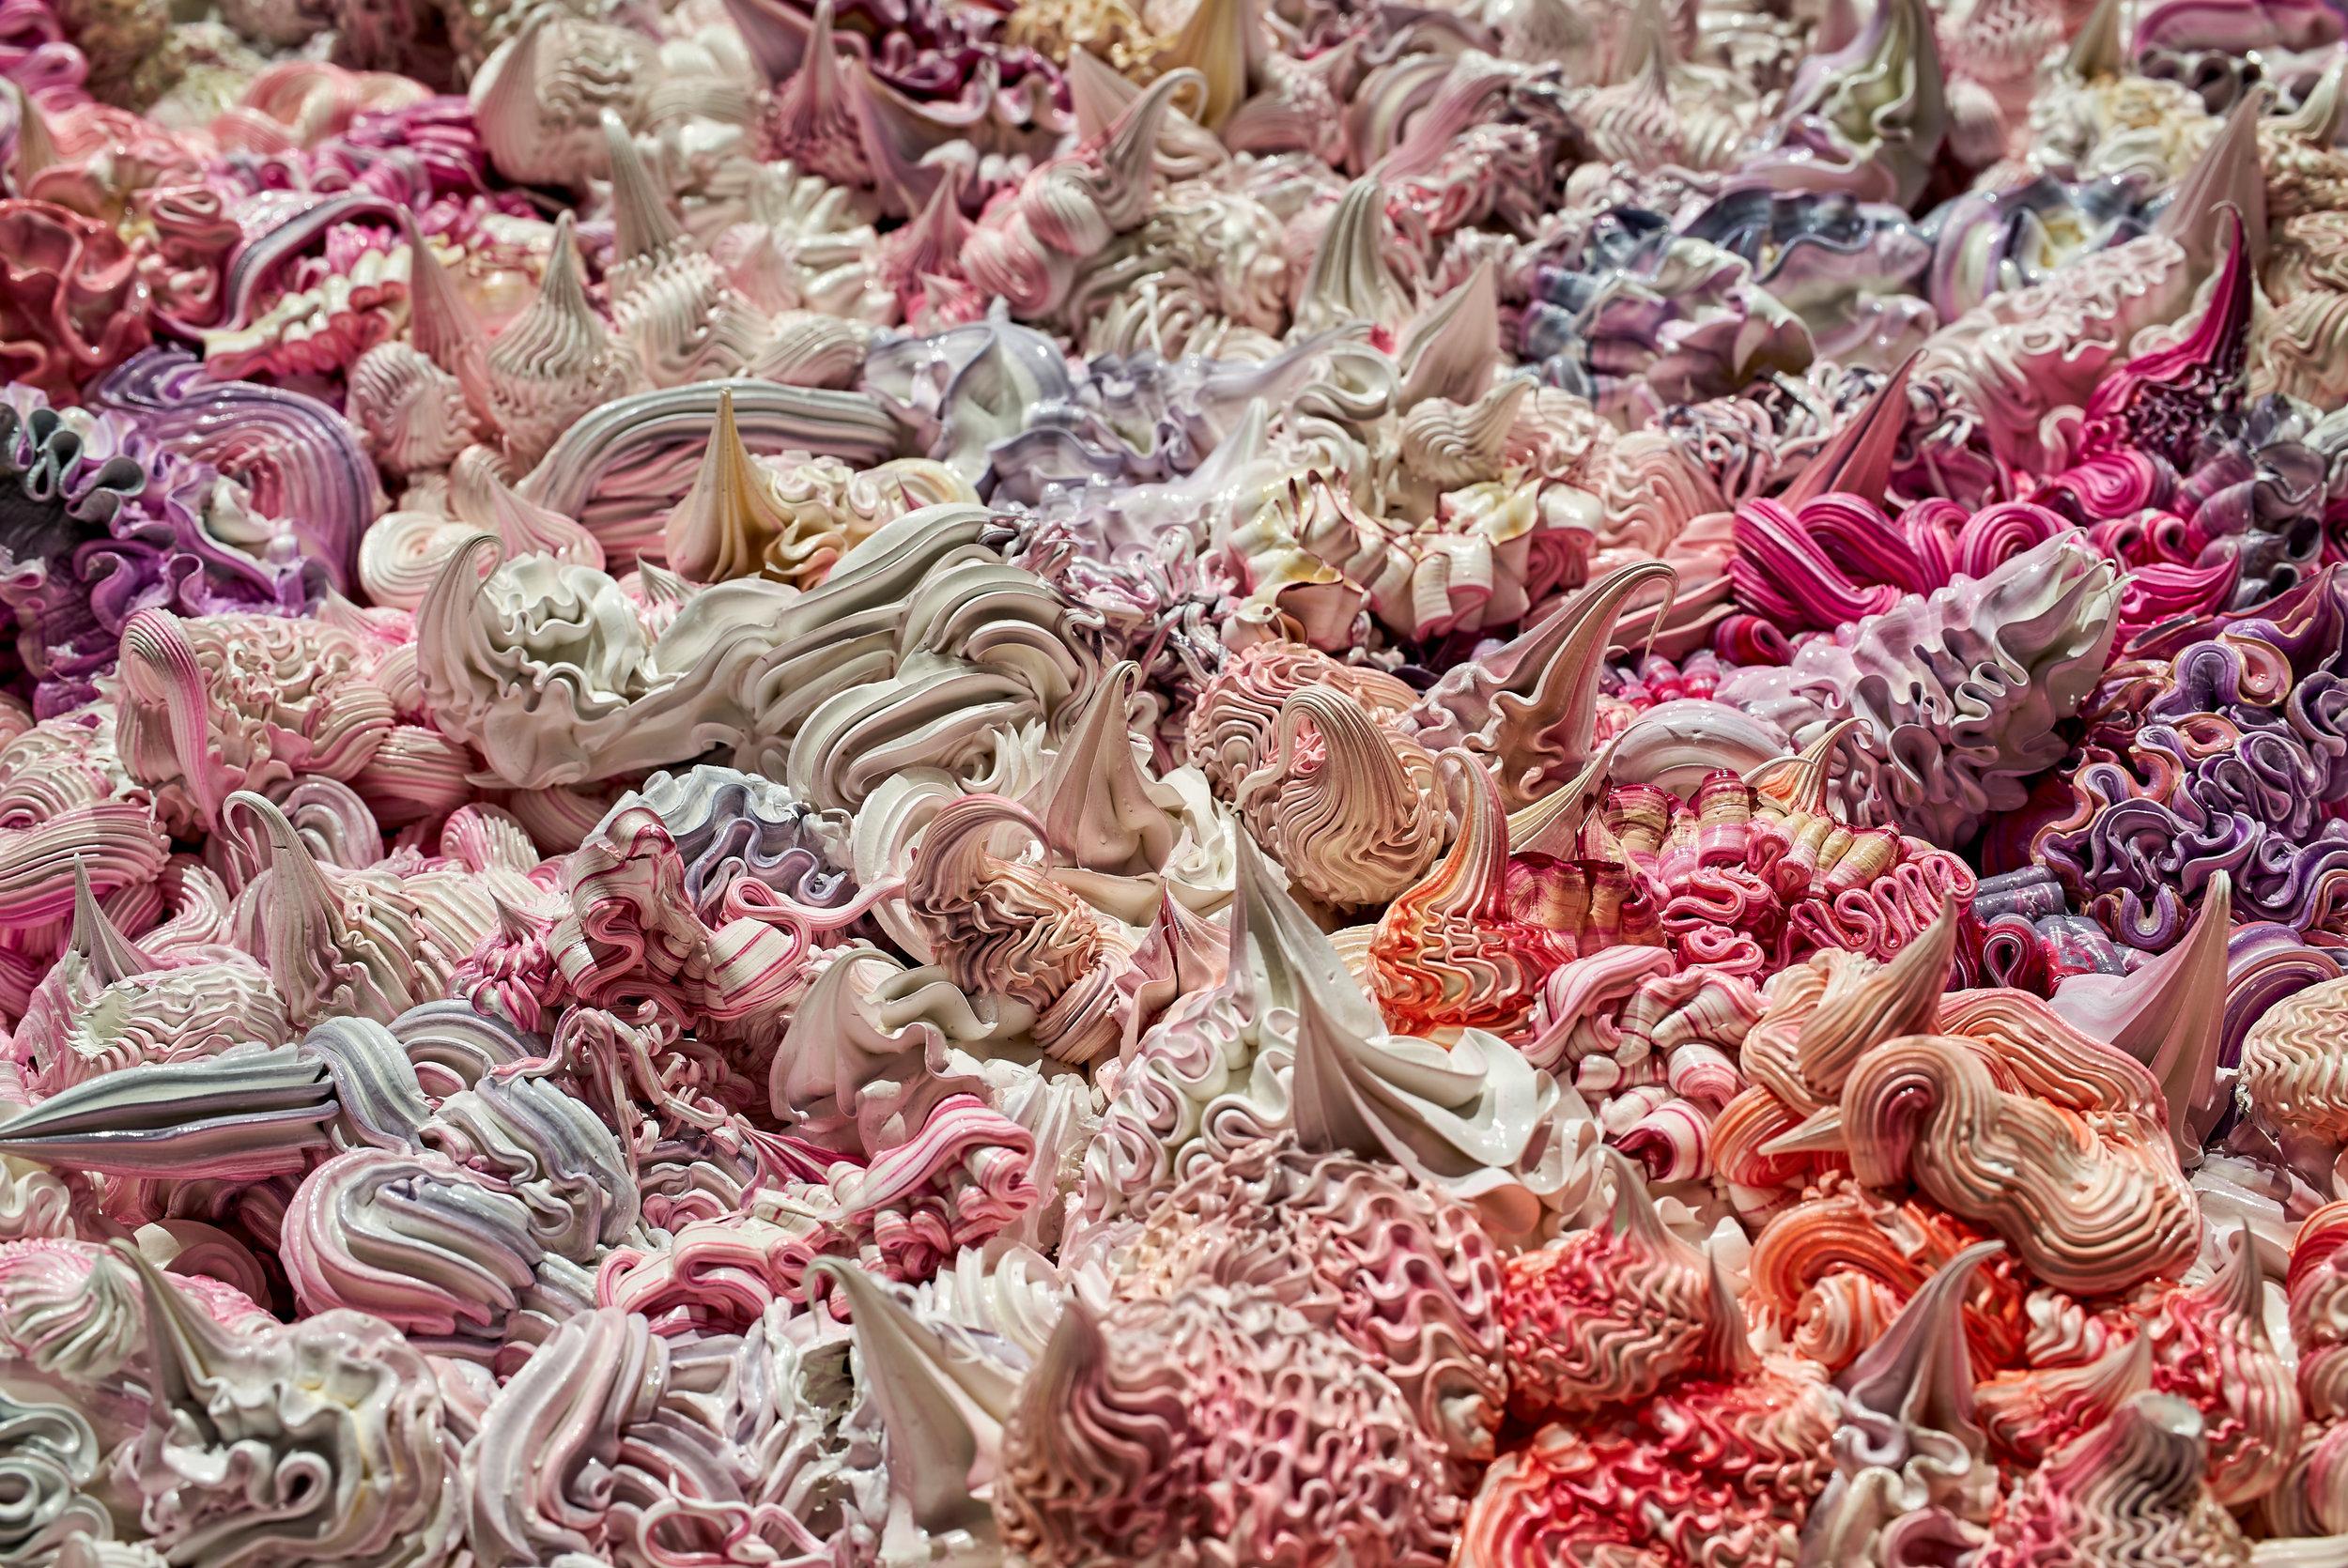 Xu Zhen ,  Under Heaven -- 2808TV1512 , 2015, Oil on canvas, aluminium, 98 3/8′′ x 70 3/4′′ x 5 1/2′′ (249,9 x 179,7 x 14 cm) (Detail)